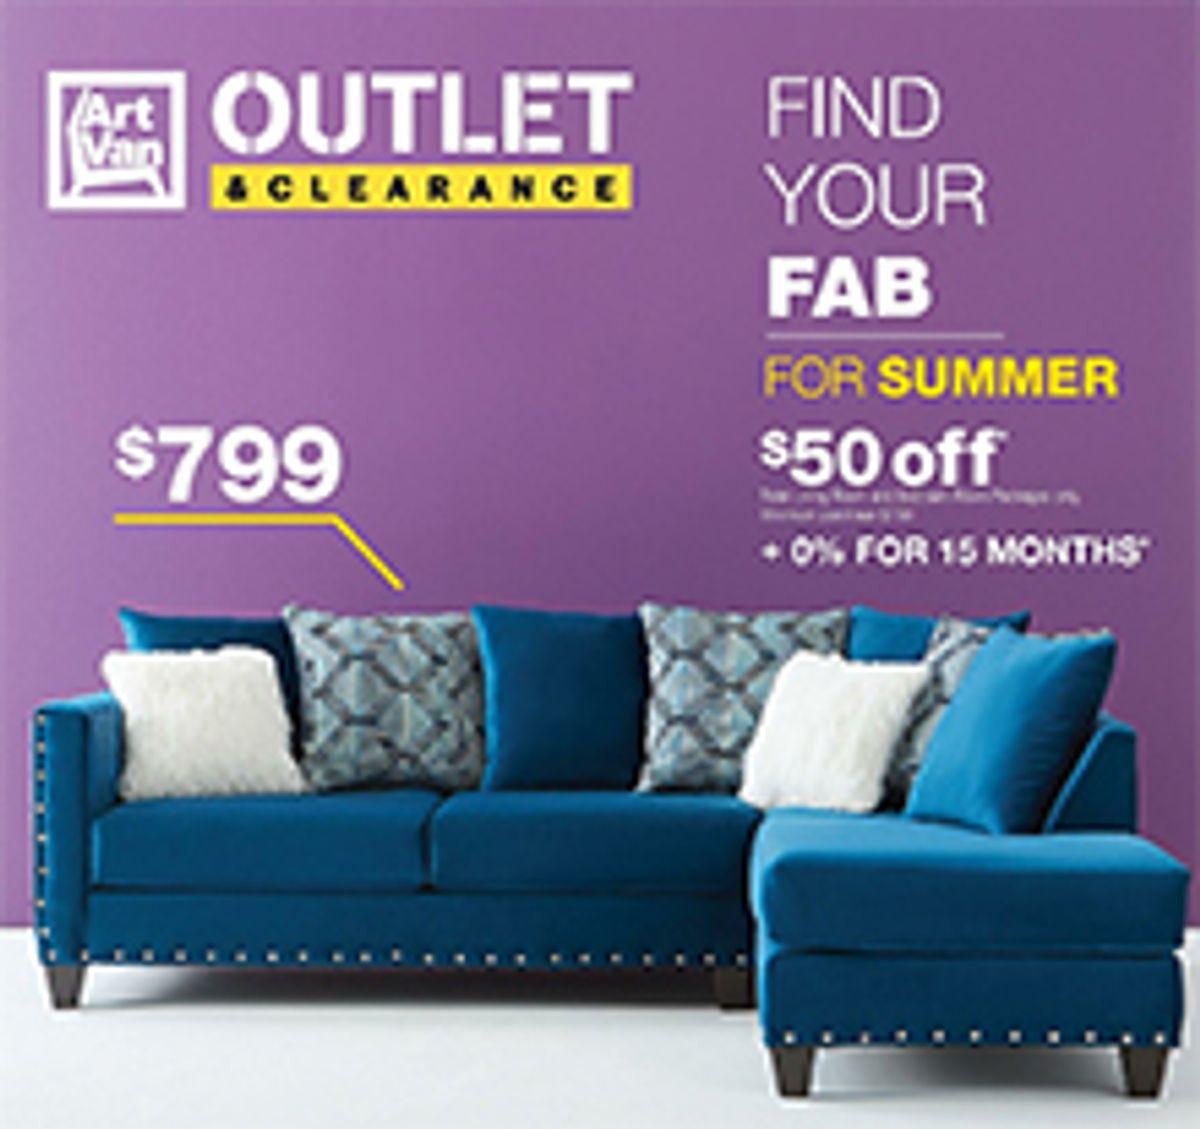 art van furniture catalog coupon code